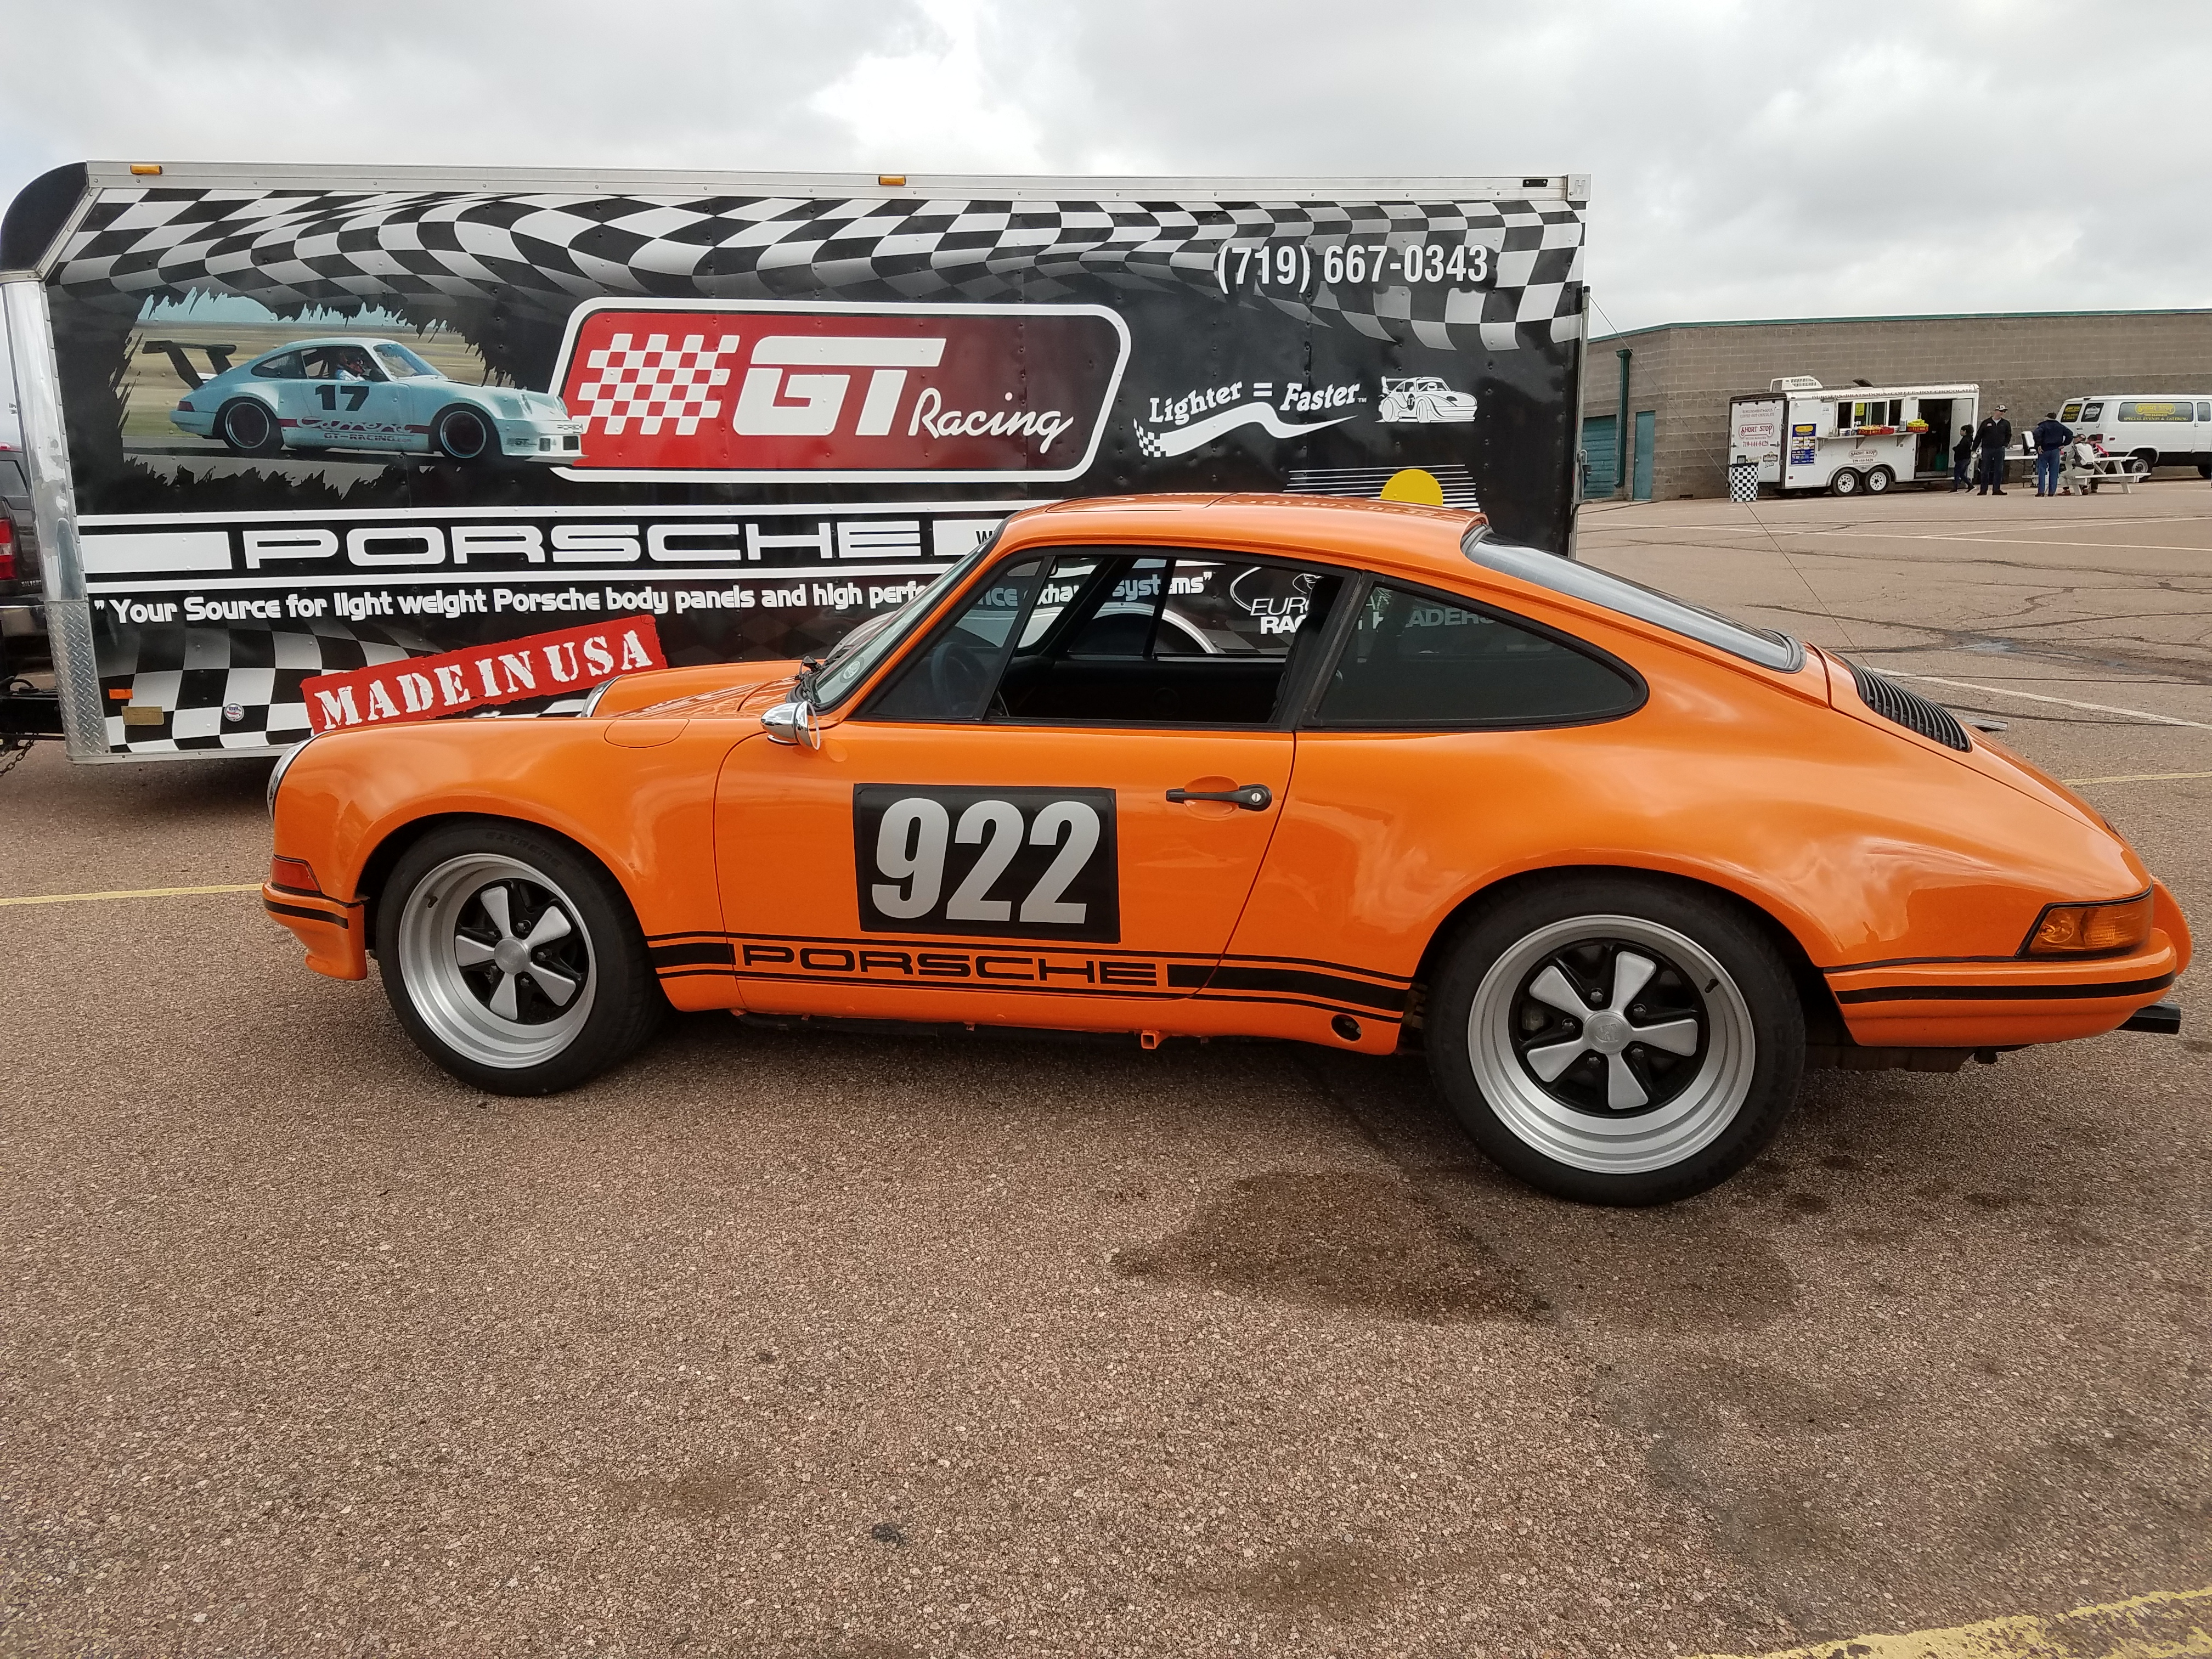 Porsche Body Parts Porsche Race Headers And Exhaust